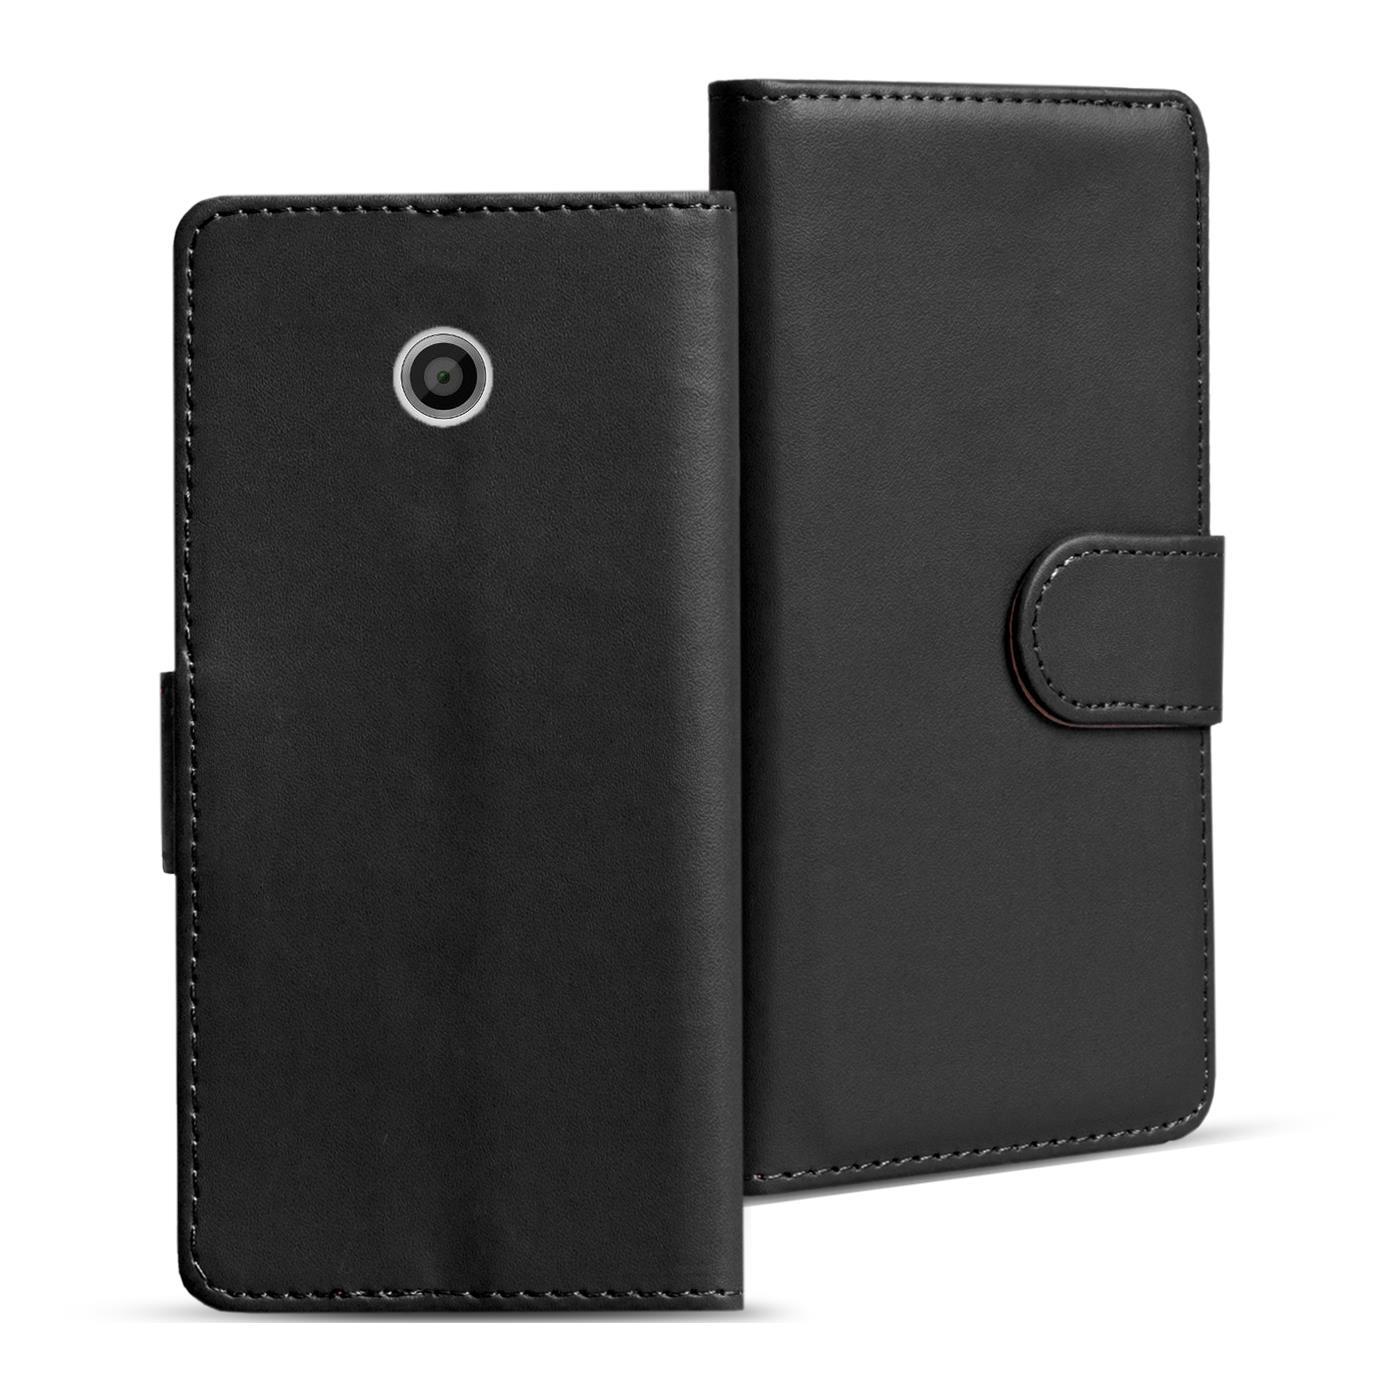 Handy-Klapp-Tasche-Schutz-Huelle-Book-Flip-Cover-Case-Schutzhuelle-Etui-Klapphuelle